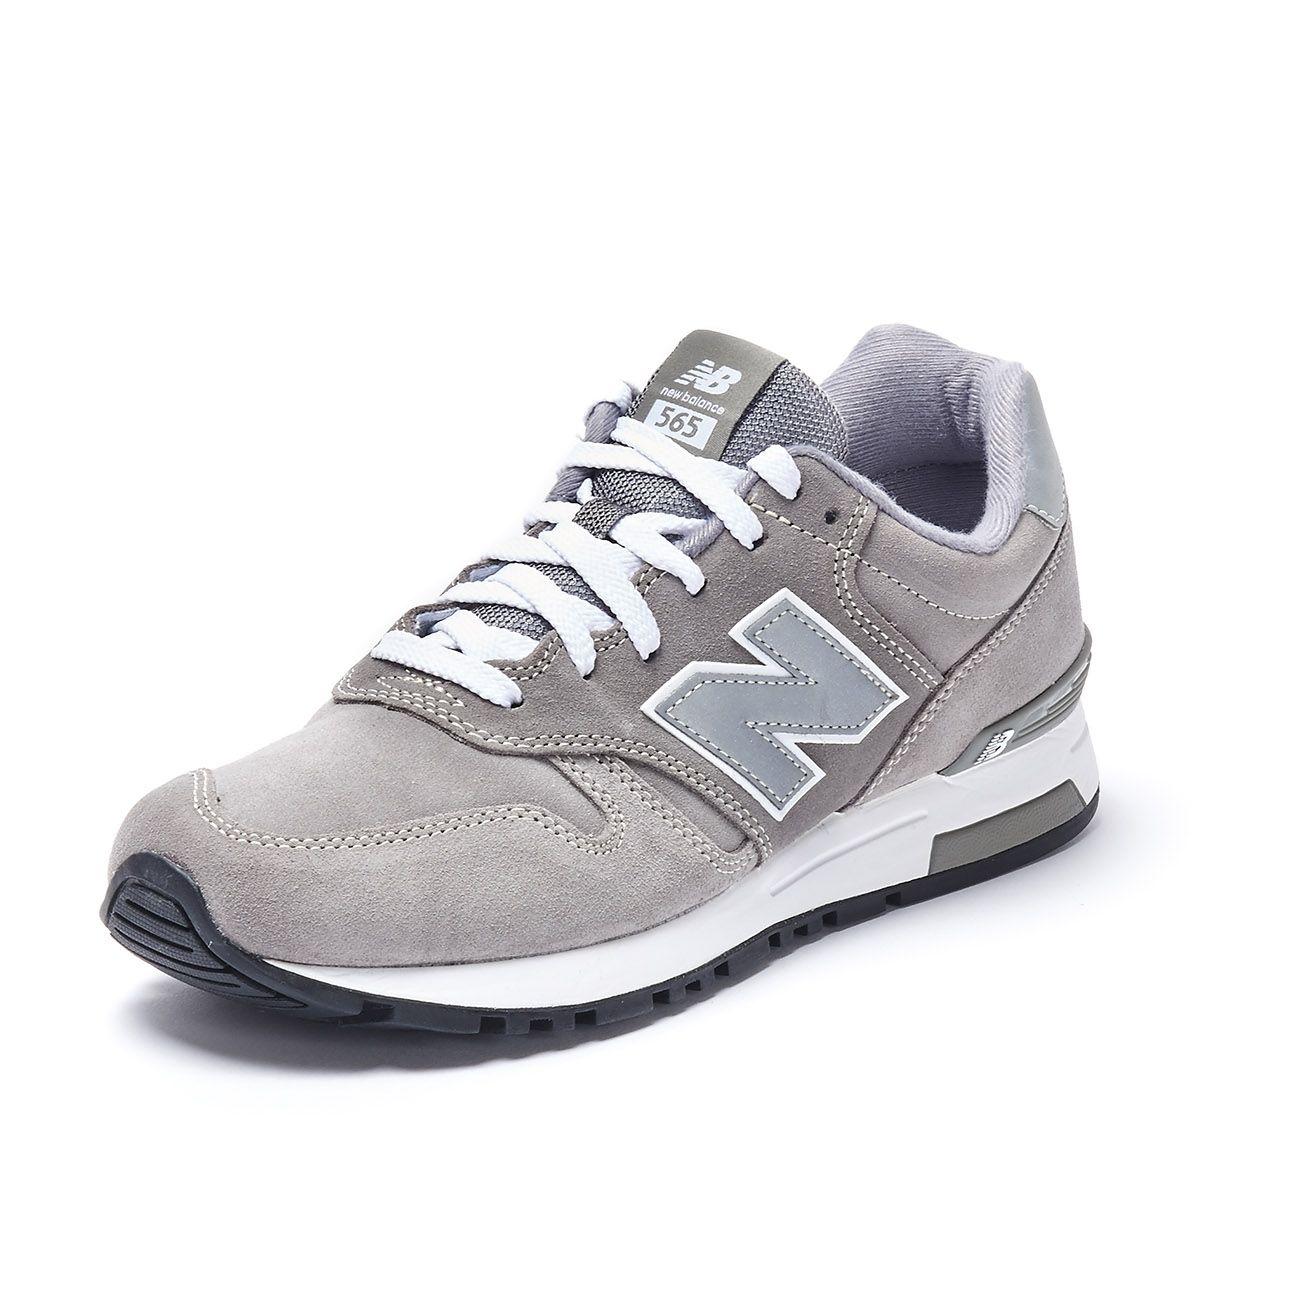 NEW BALANCE SNEAKERS LIFESTYLE 565 Man Grey | Mascheroni Sportswear